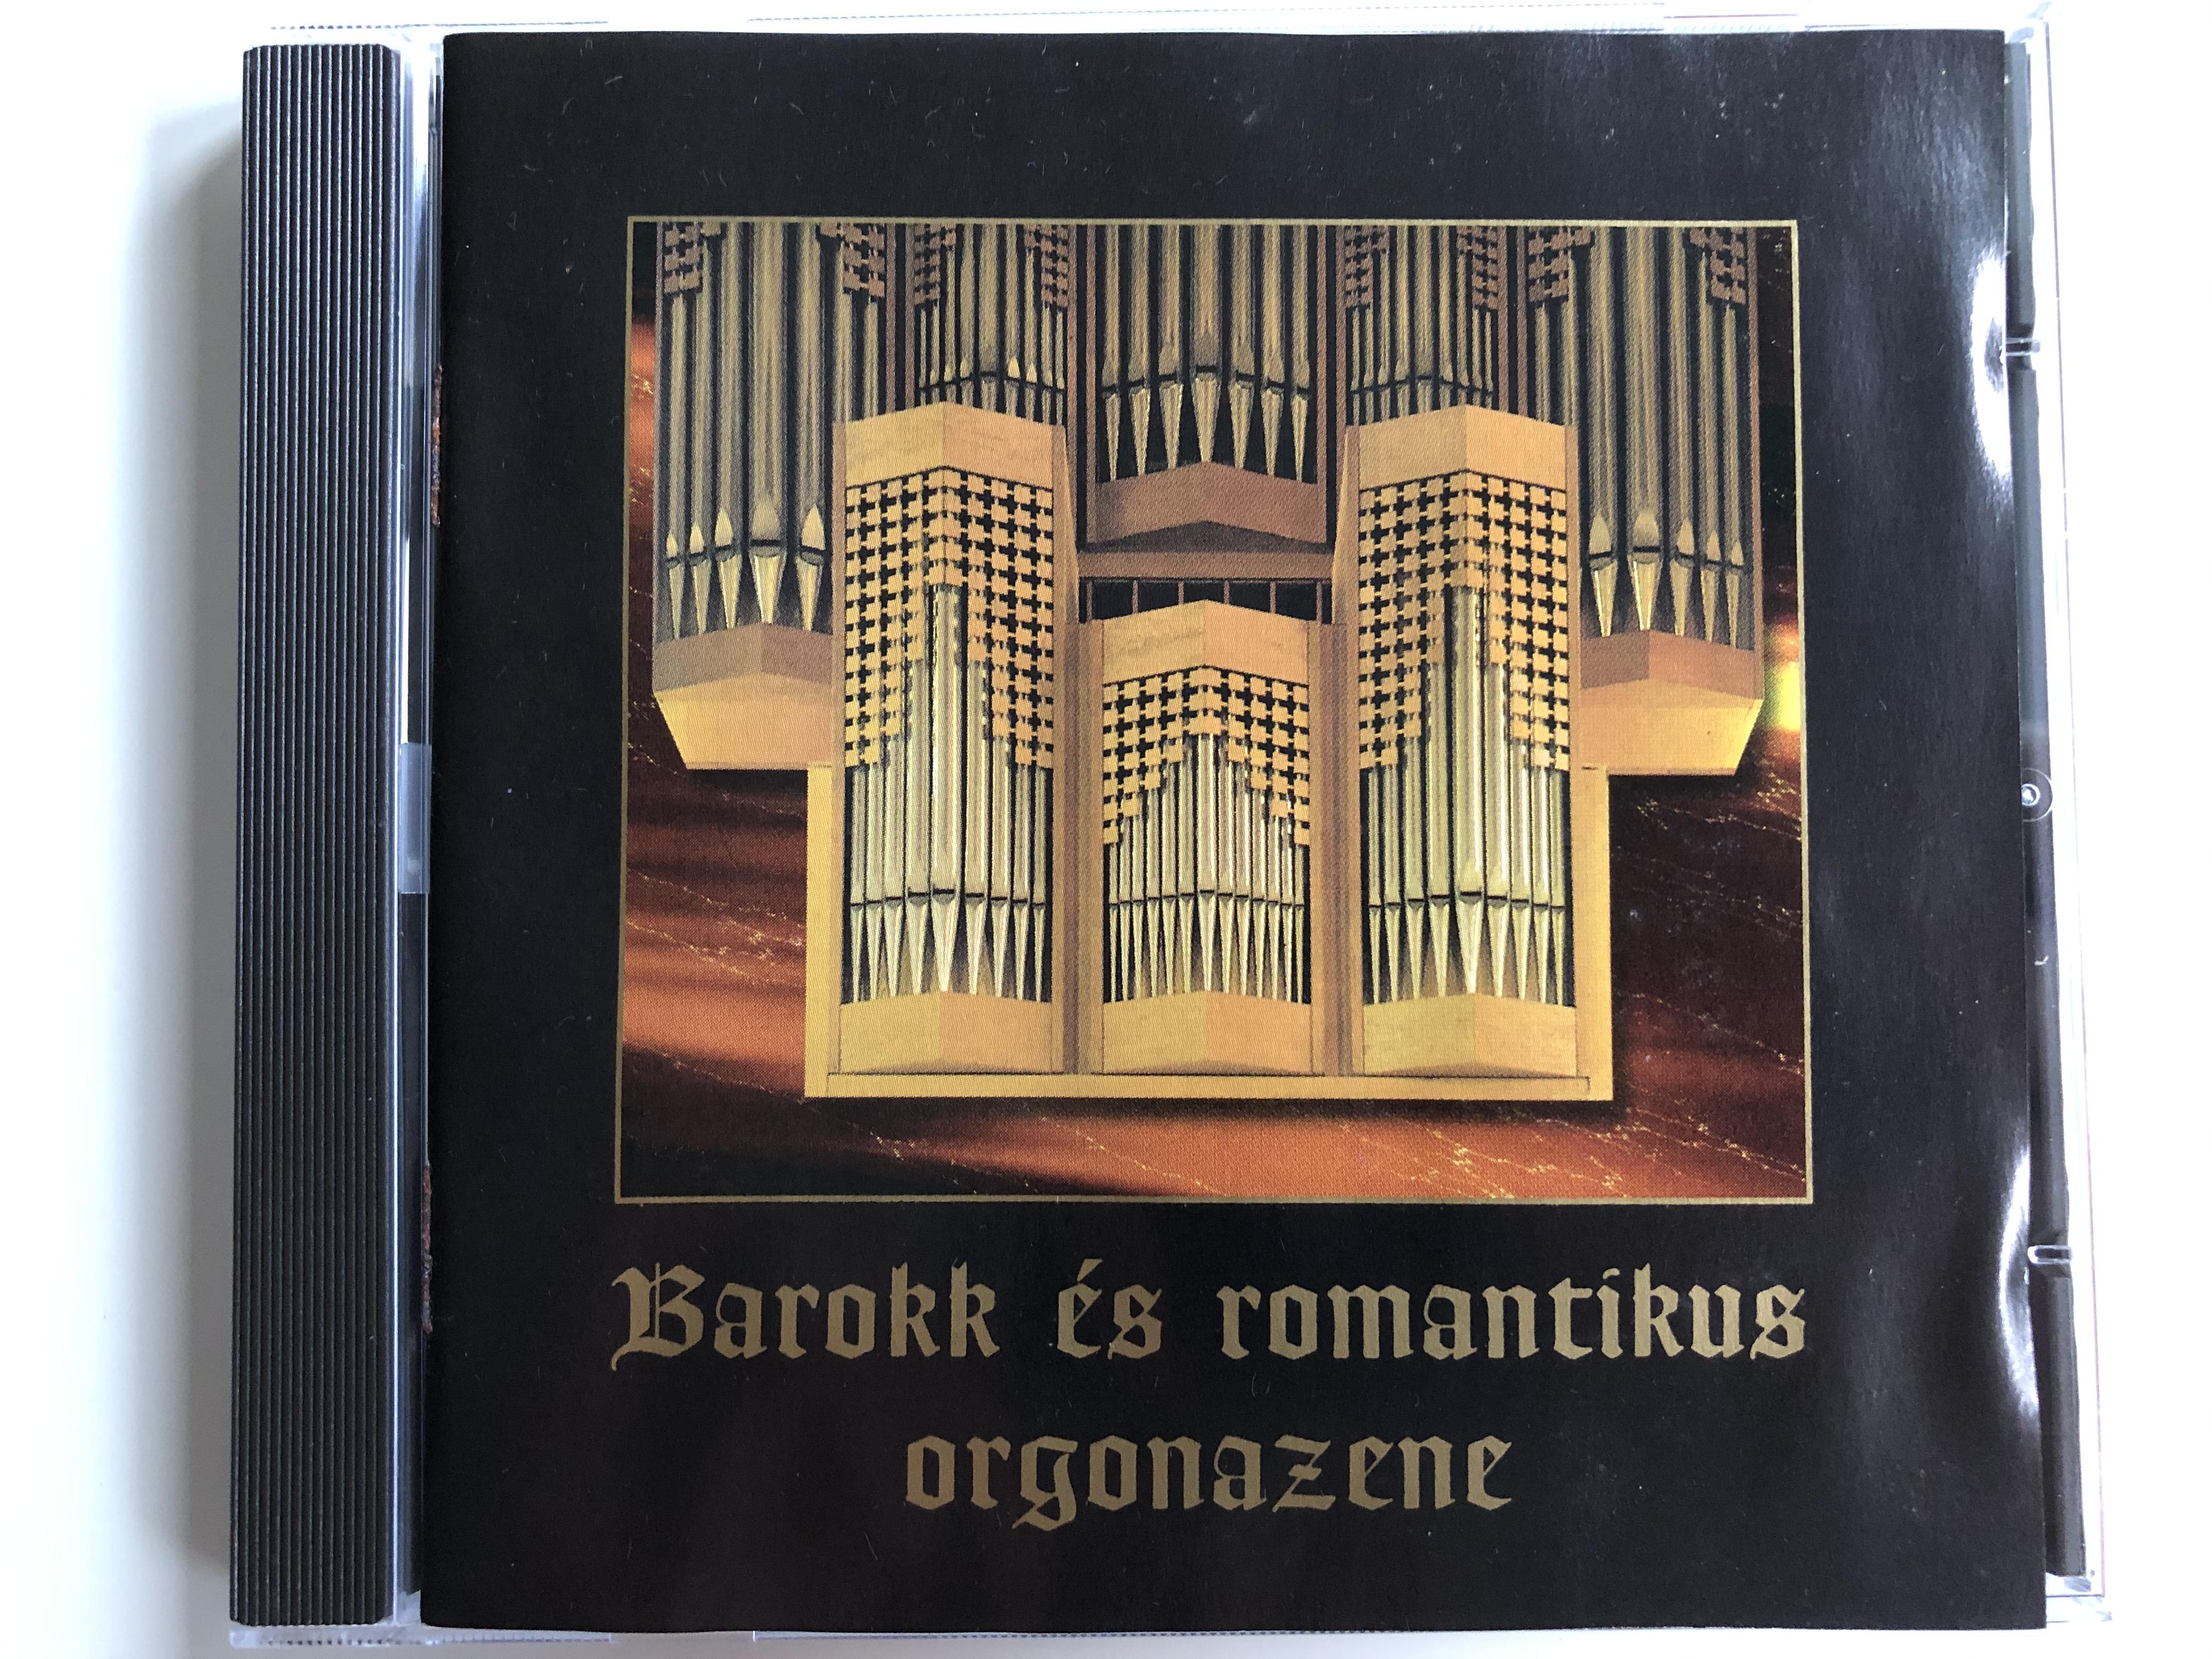 barokk-es-romantikus-organazene-a-tempo-classic-audio-cd-atcd-001-1-.jpg